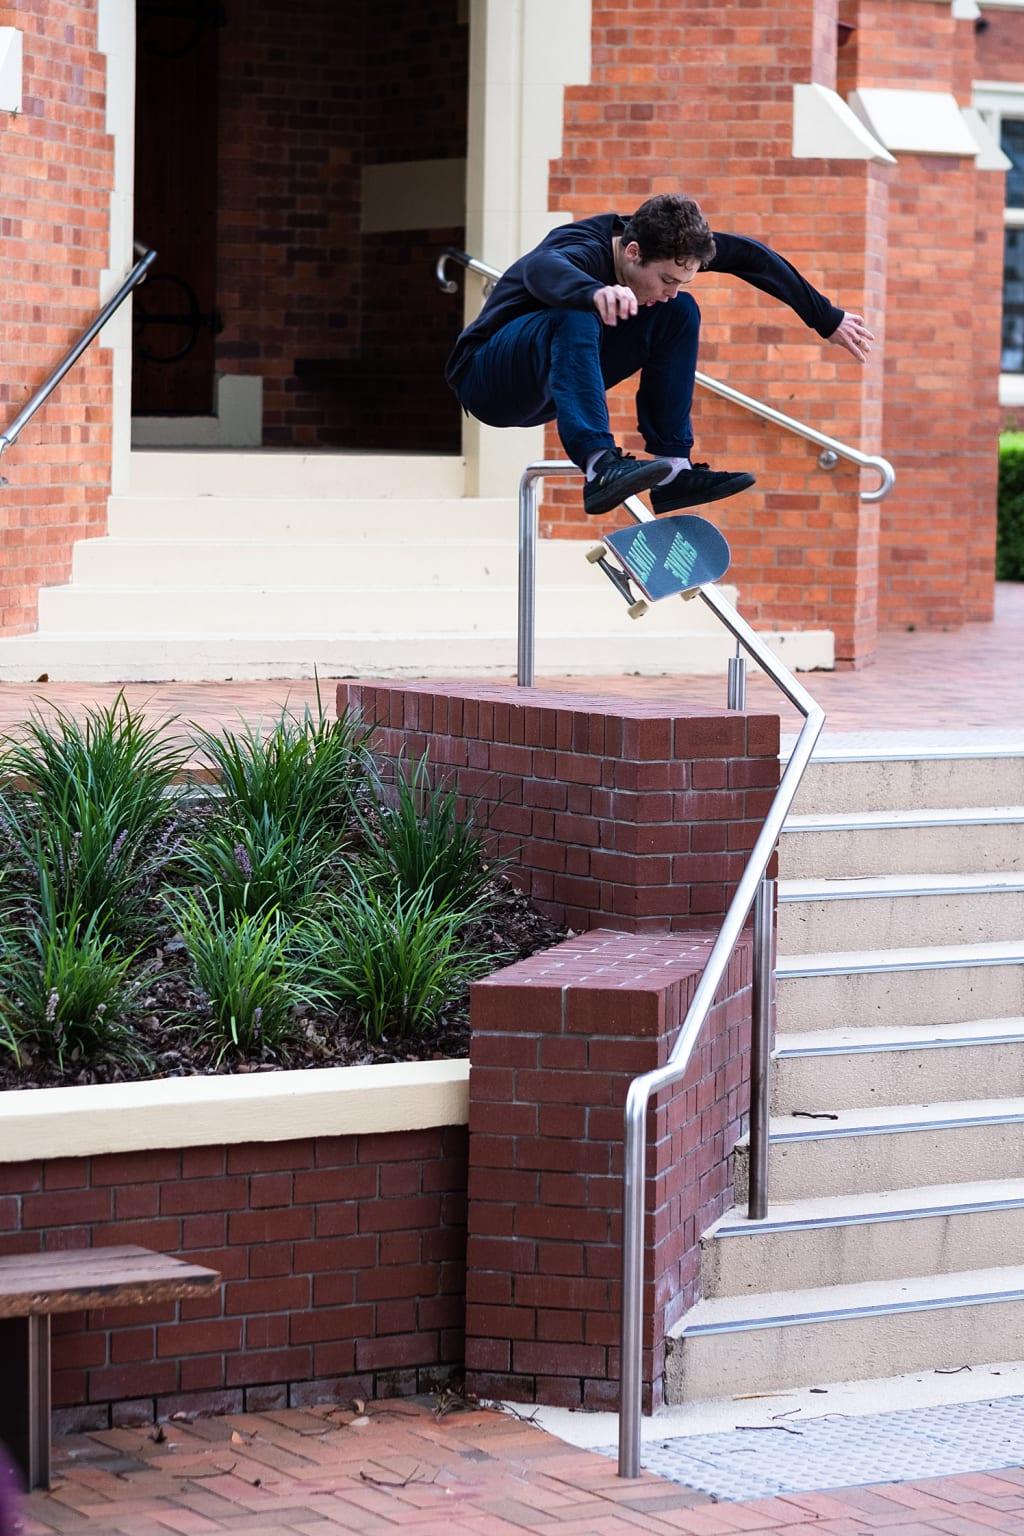 adidas Skateboarding: Reverb Video